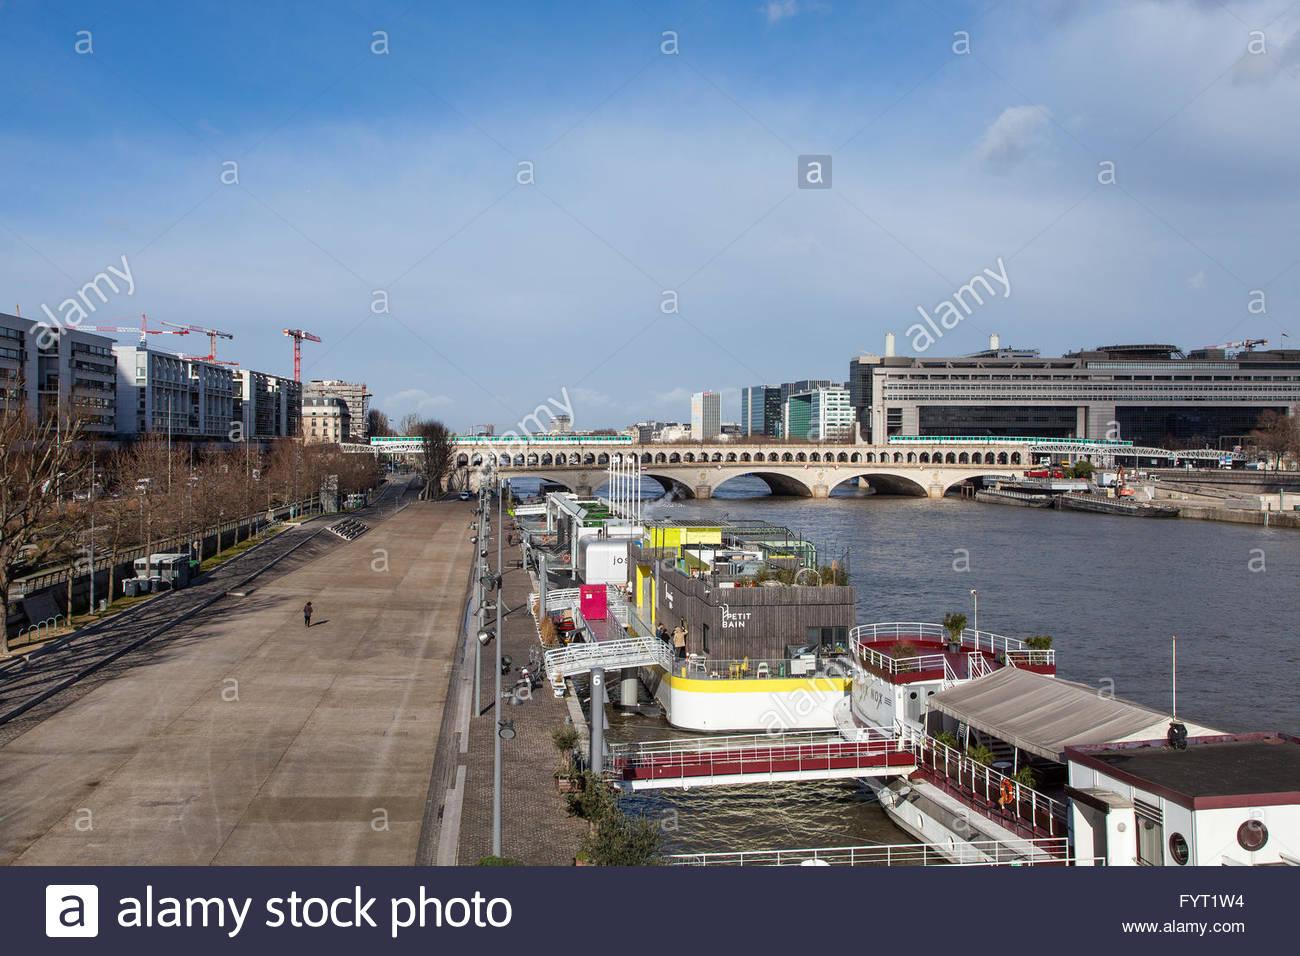 Finances ministry, Bercy dock Paris, France, 2016 - Stock Image